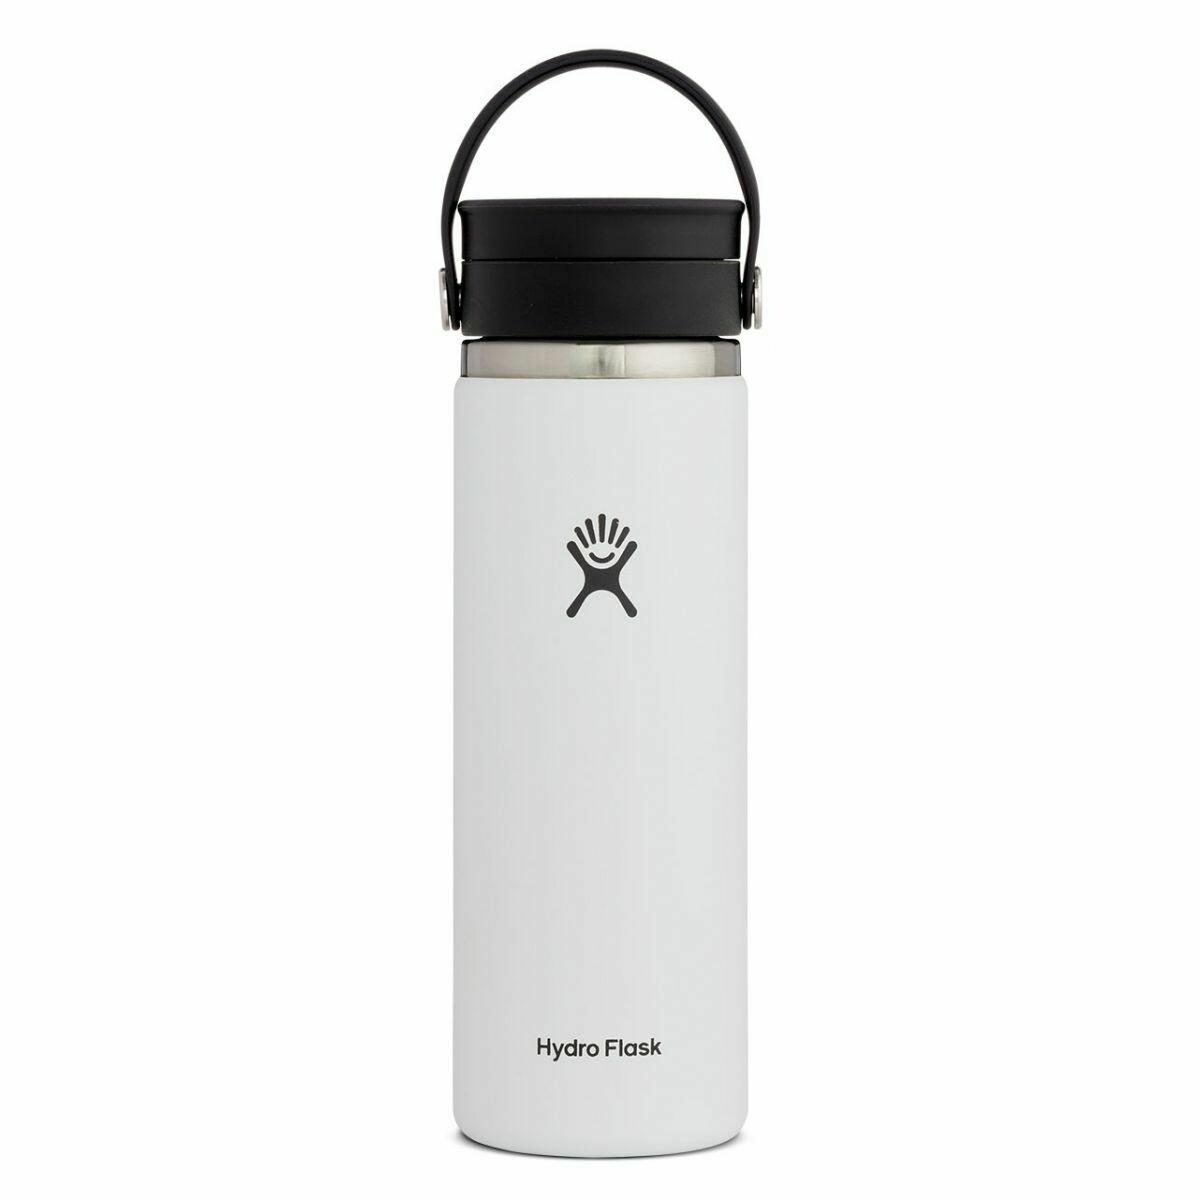 Hydro Flask 20 oz Wide Mouth w/Flex Sip Lid WHITE